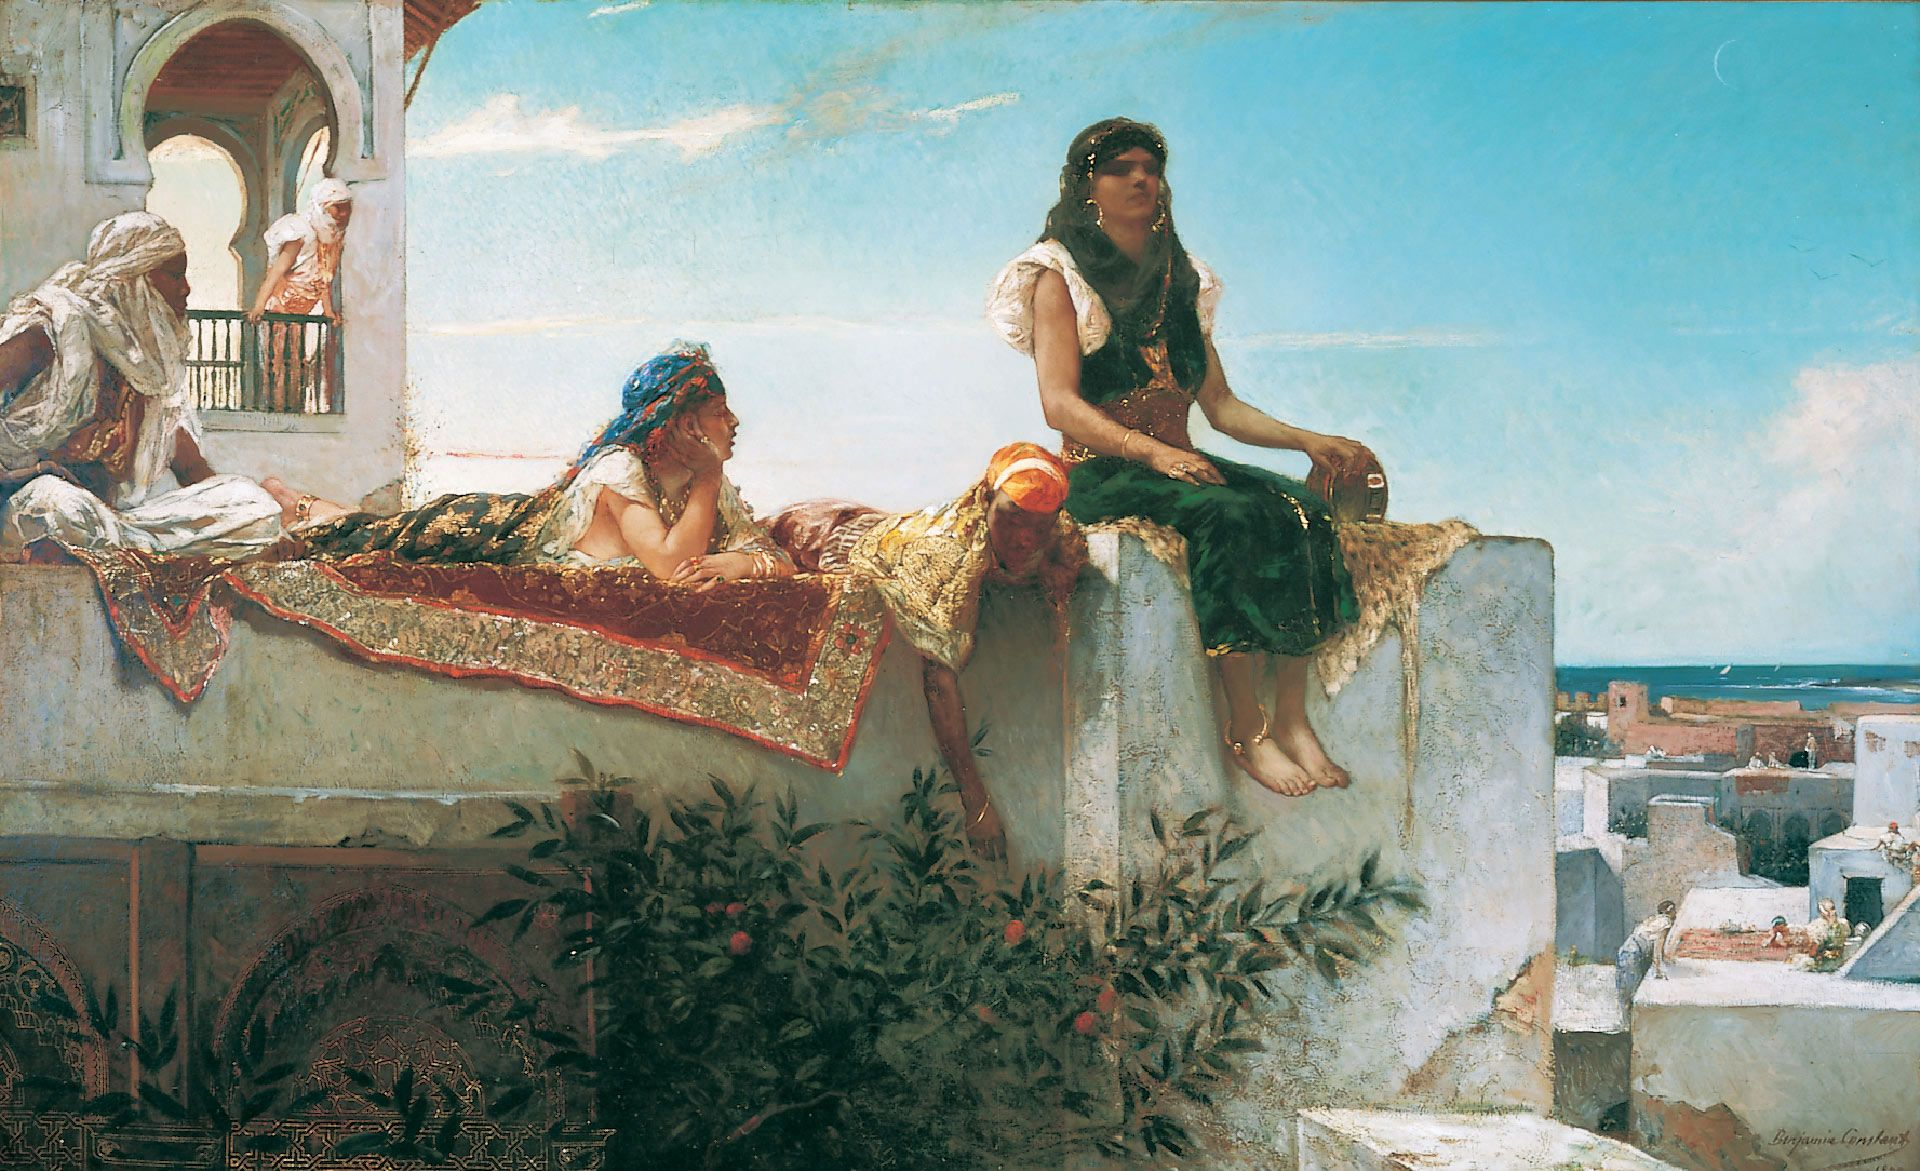 Jean-Joseph Benjamin-Constant, evening on the Terrace (Morocco), 1879